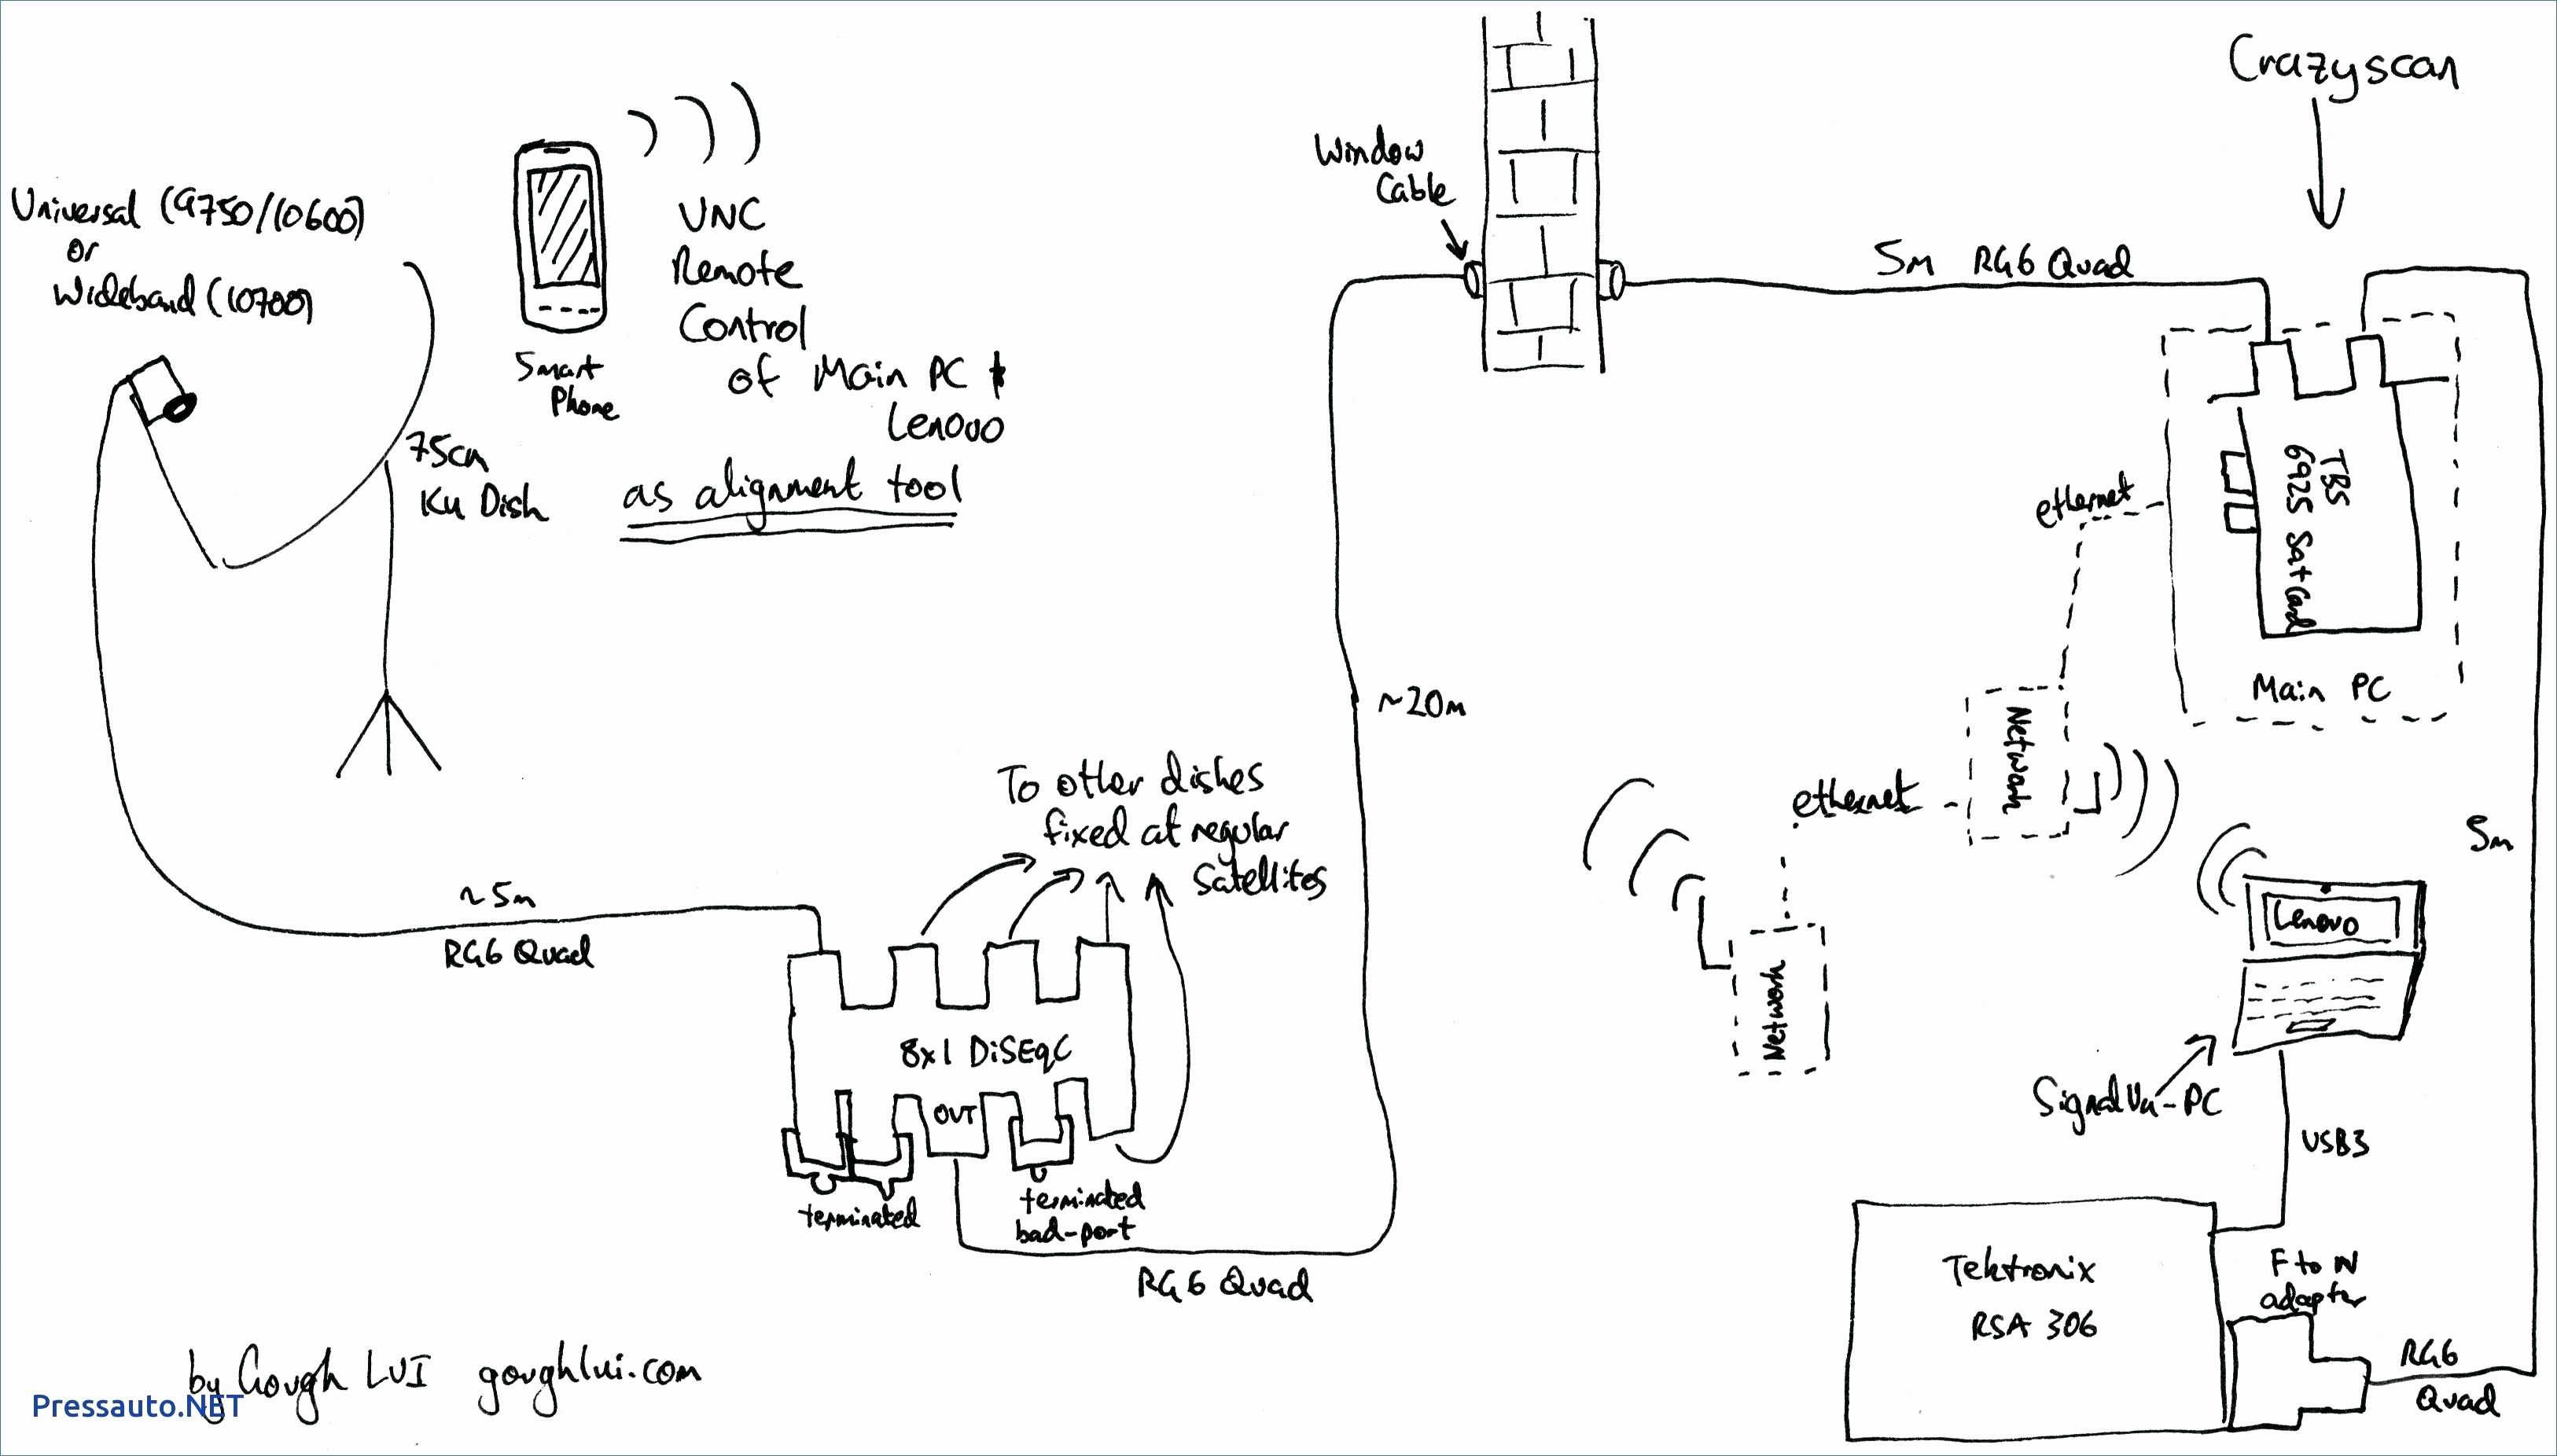 Sunset Trail Rv Satellite Wiring Diagram | Manual E-Books - Rv Cable And Satellite Wiring Diagram